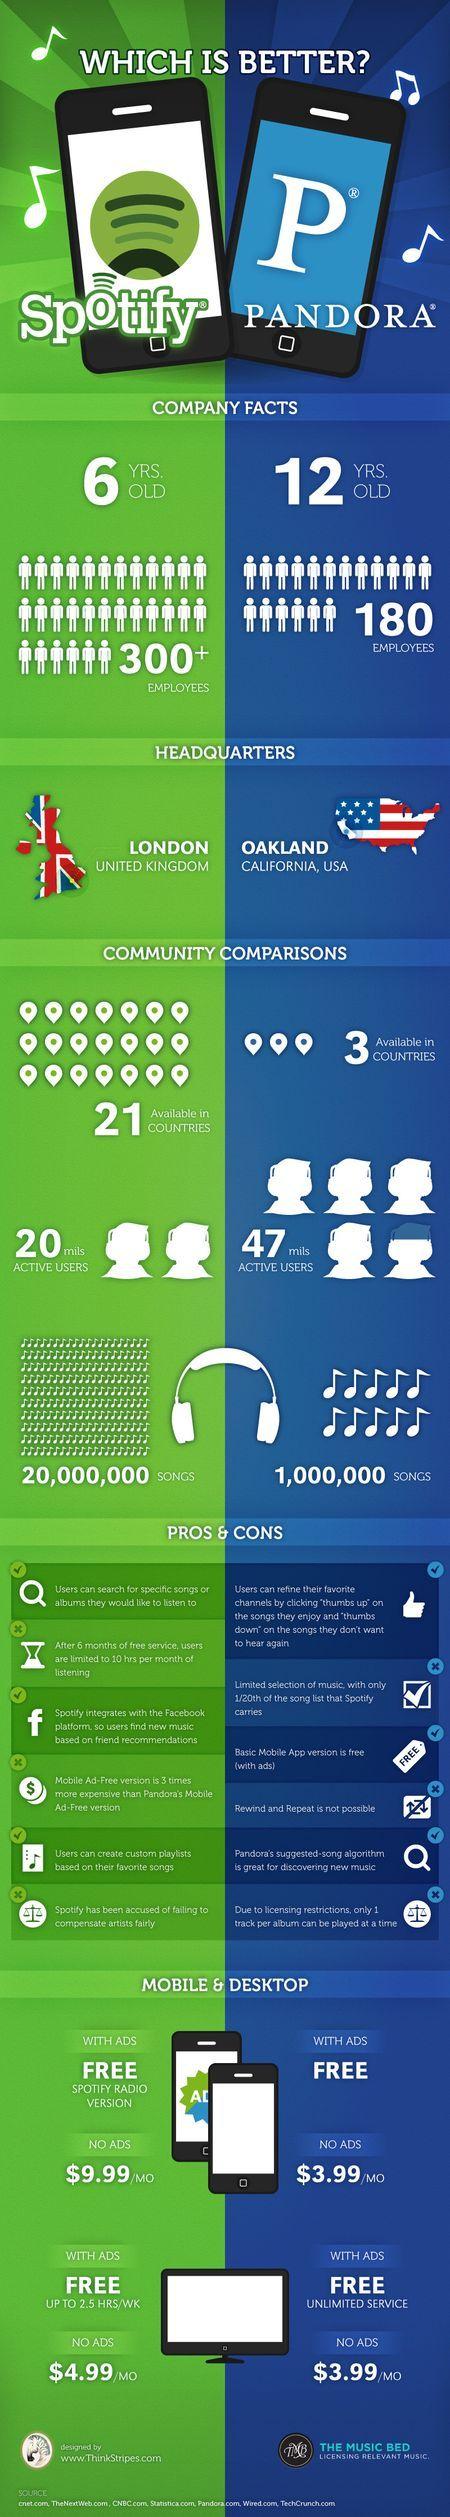 Spotify vs Pandora ........  Fight infographic